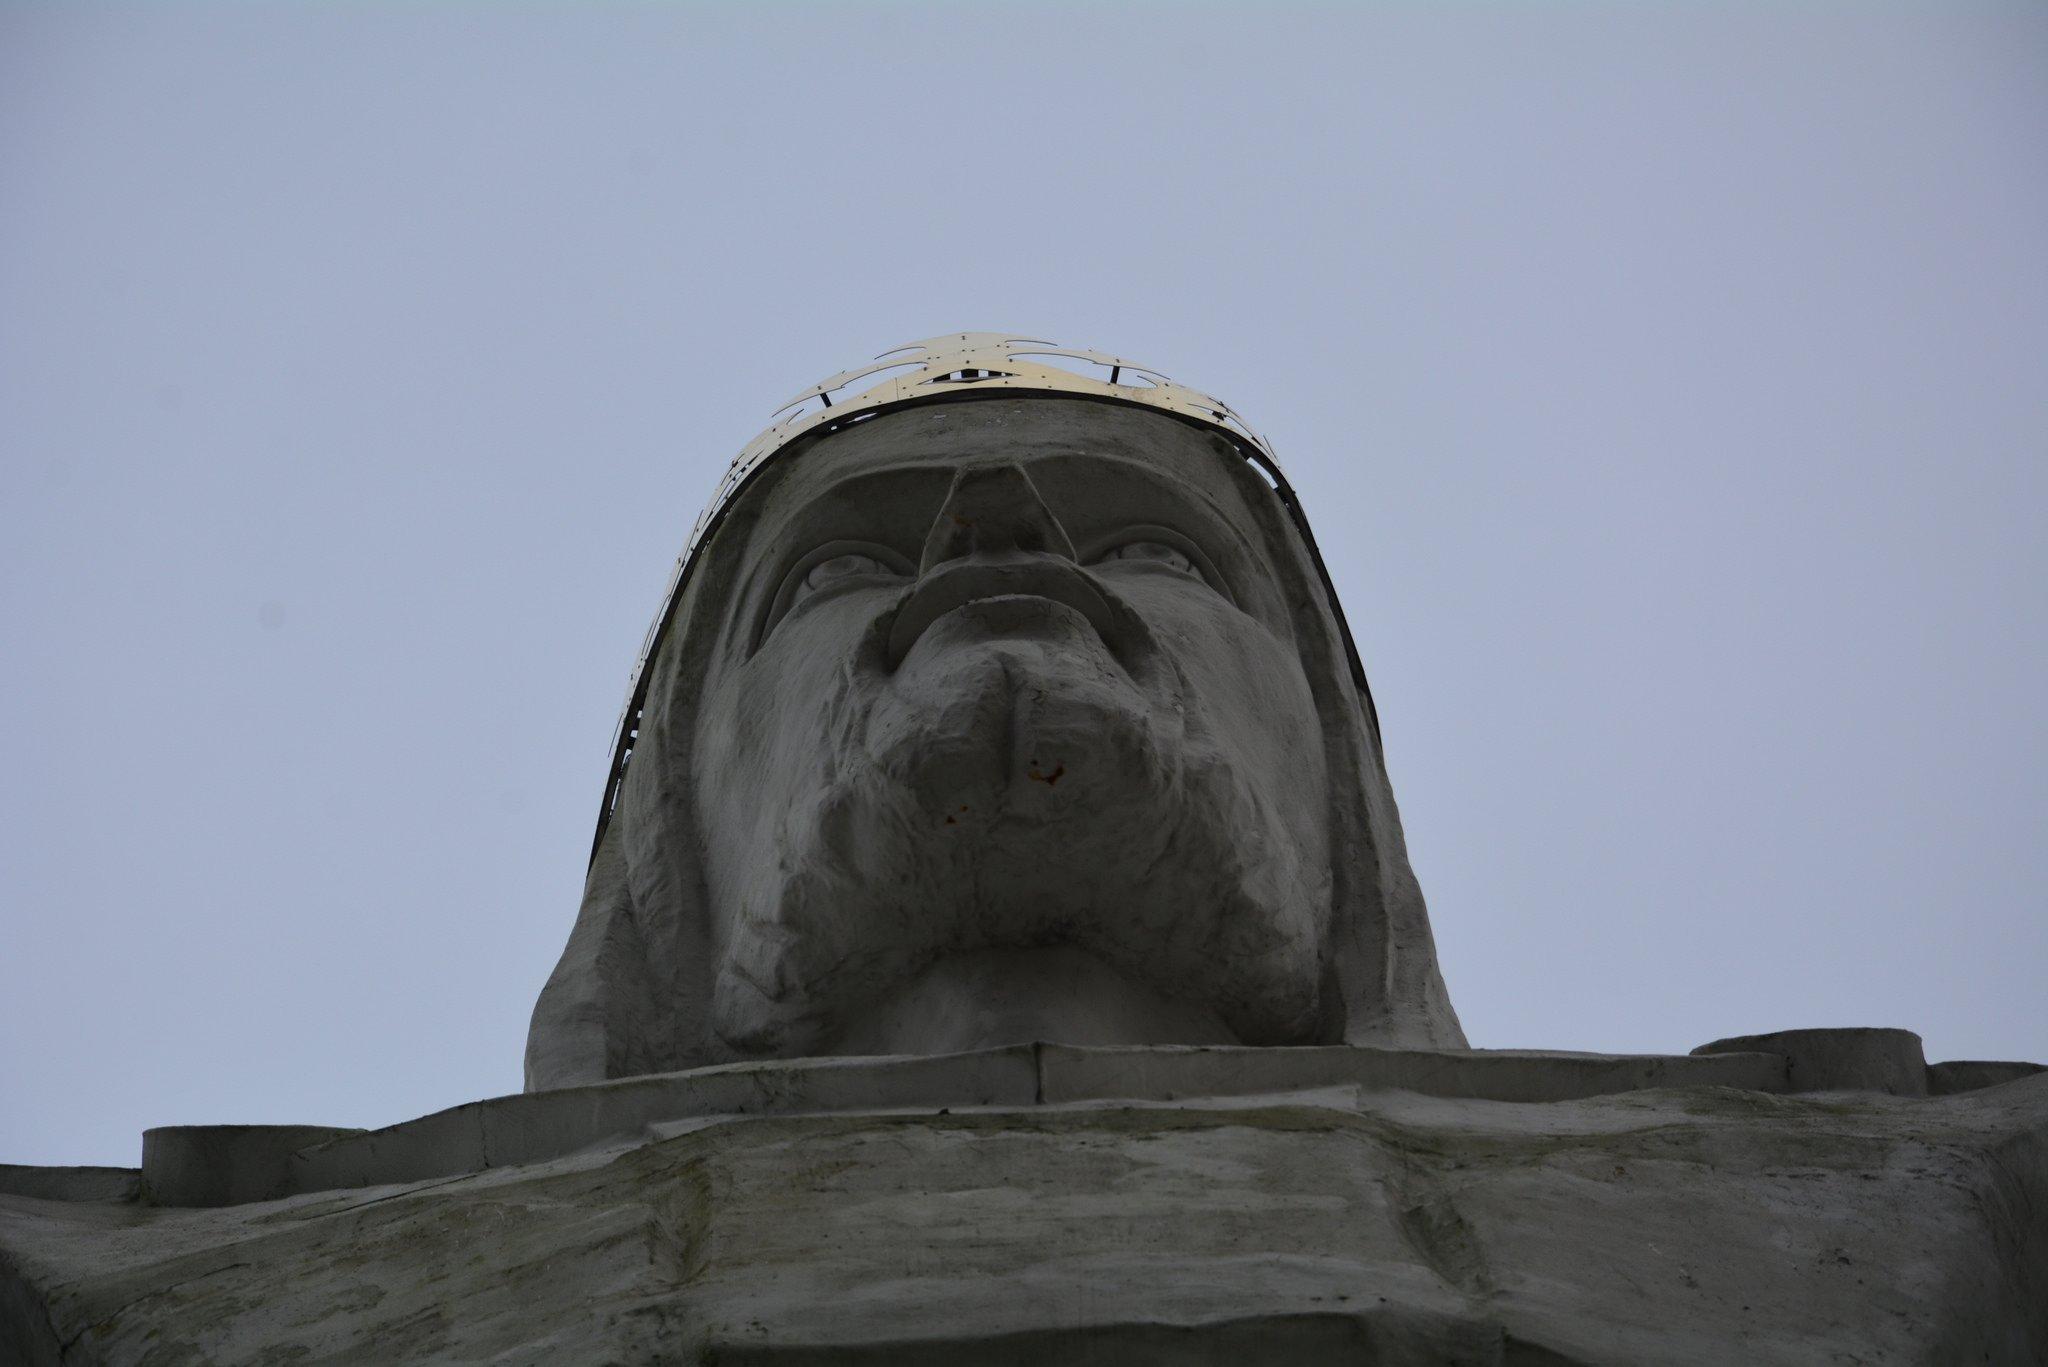 Pomnik Chrystusa Krola jesus statue swiebodzin poland face view